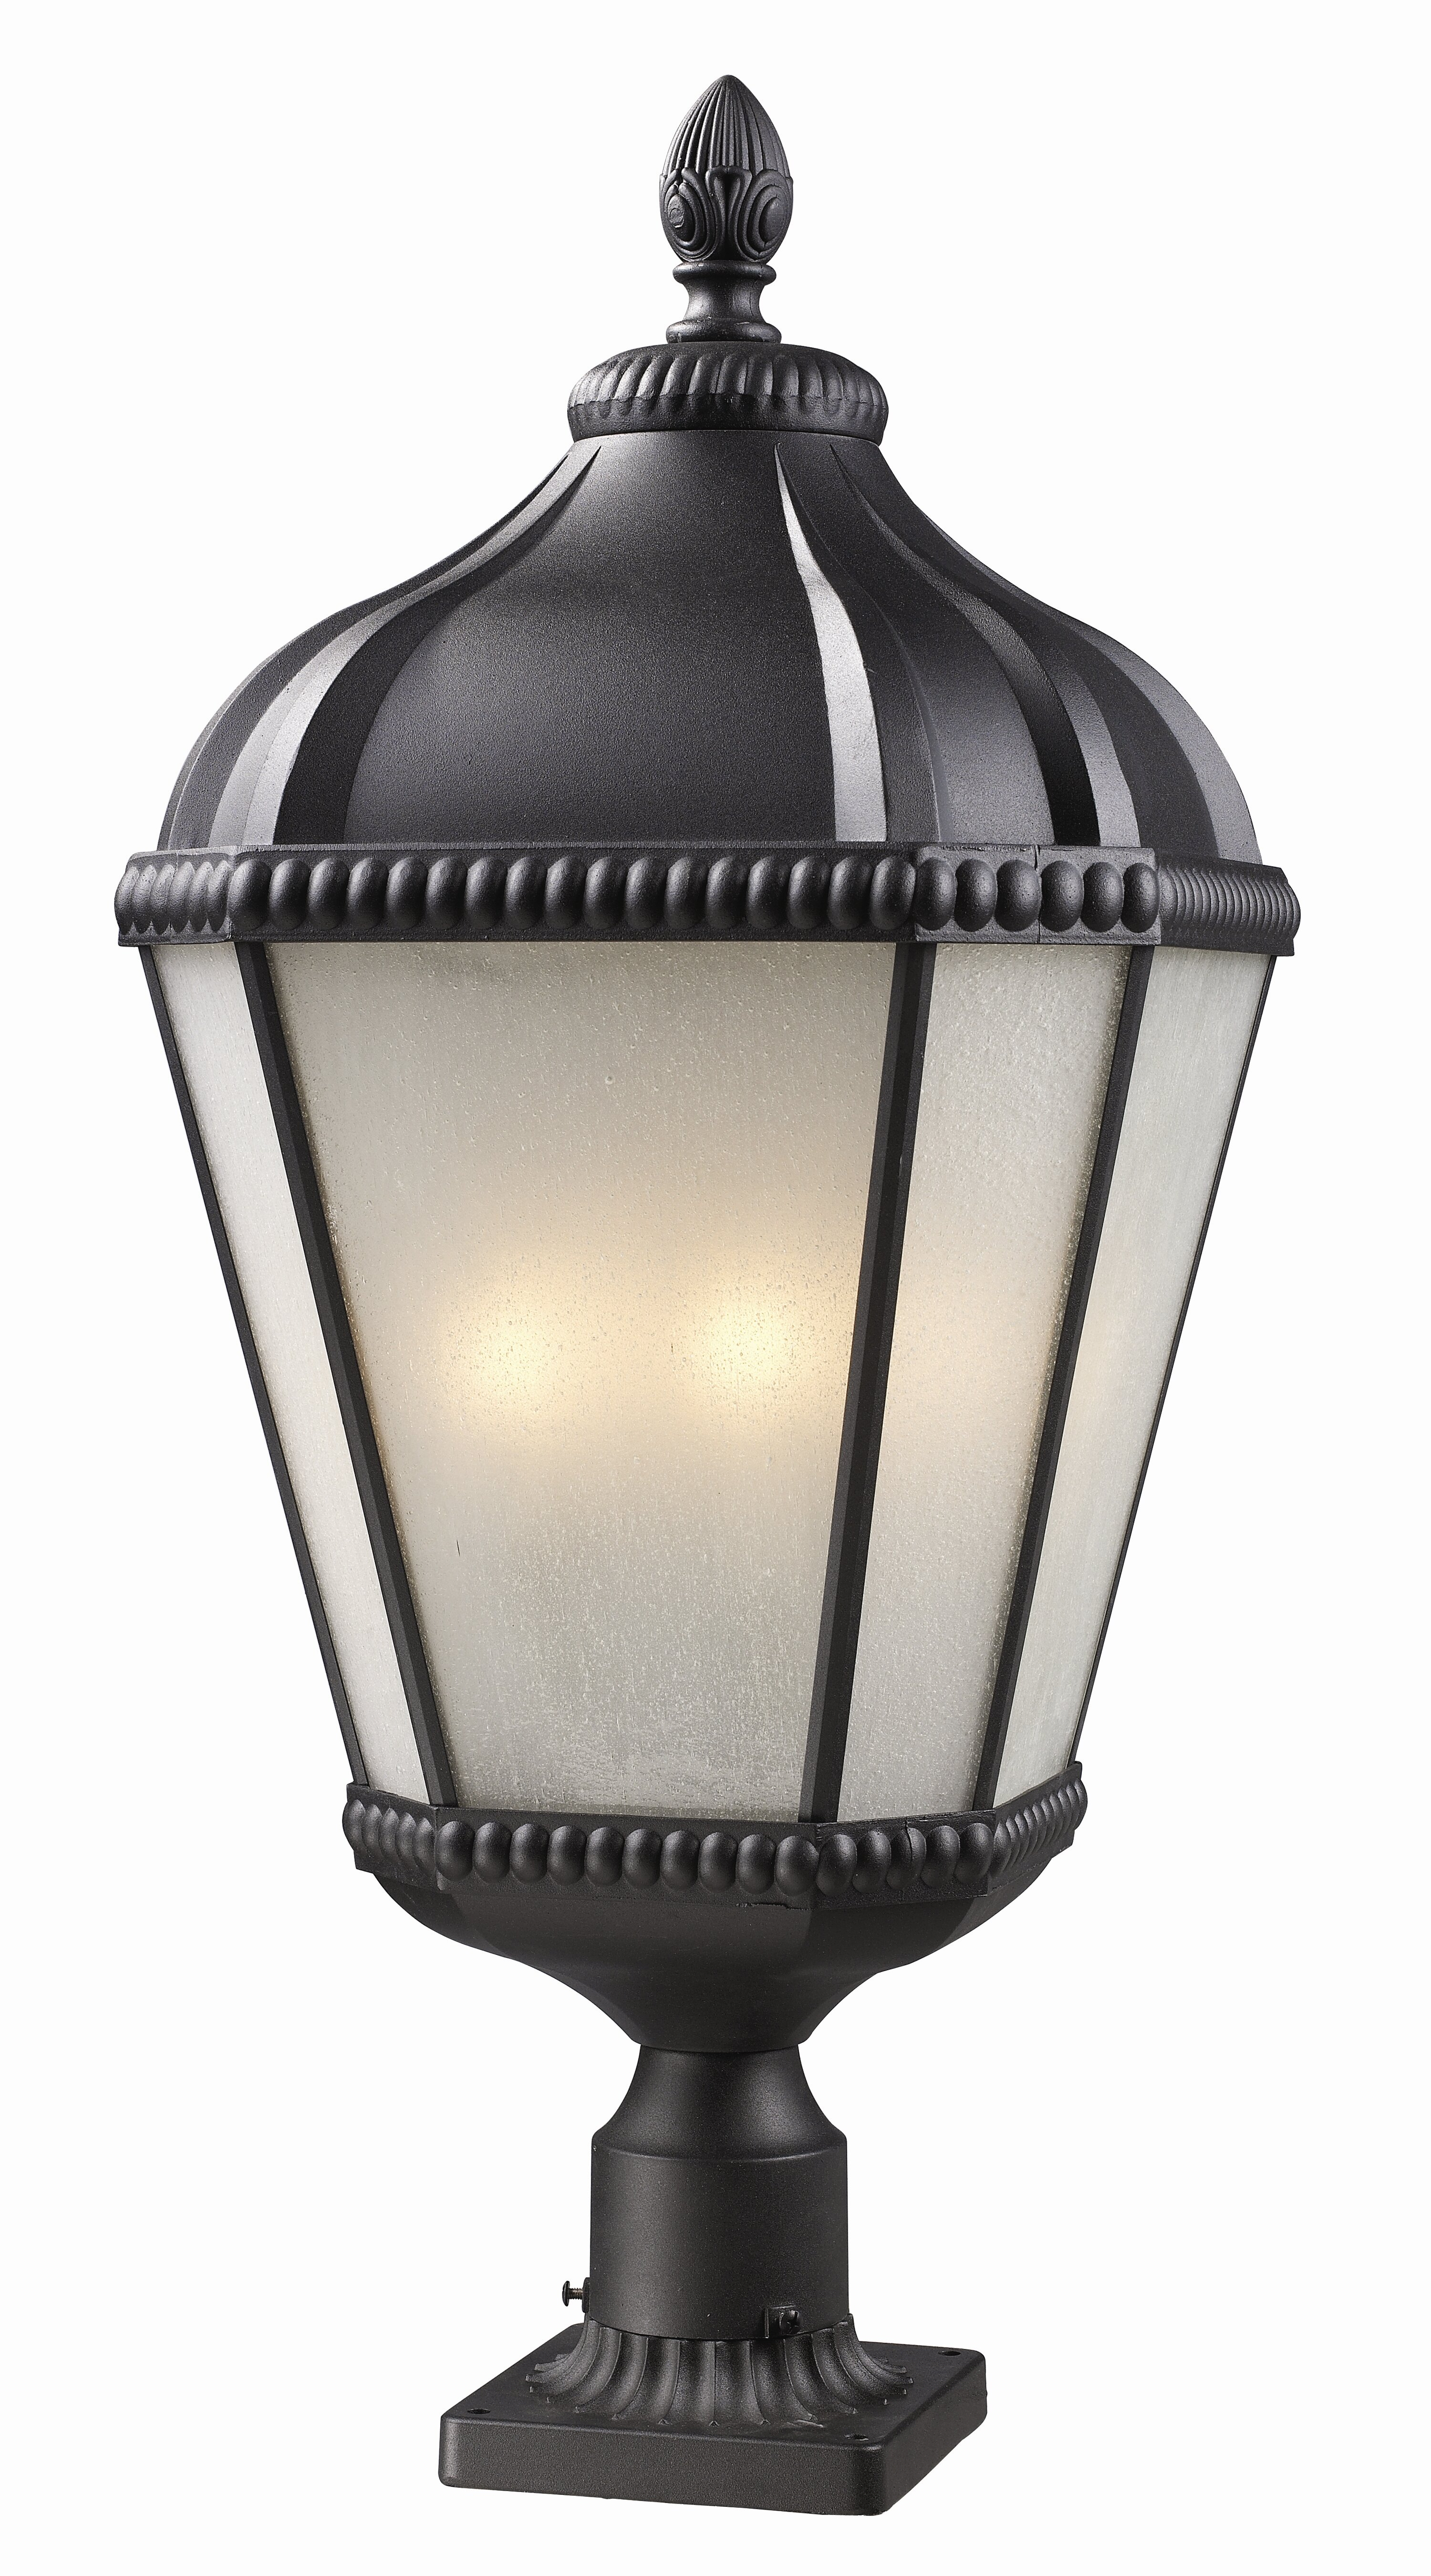 Pier Mount Light Charlton Home Post Lights You Ll Love In 2021 Wayfair